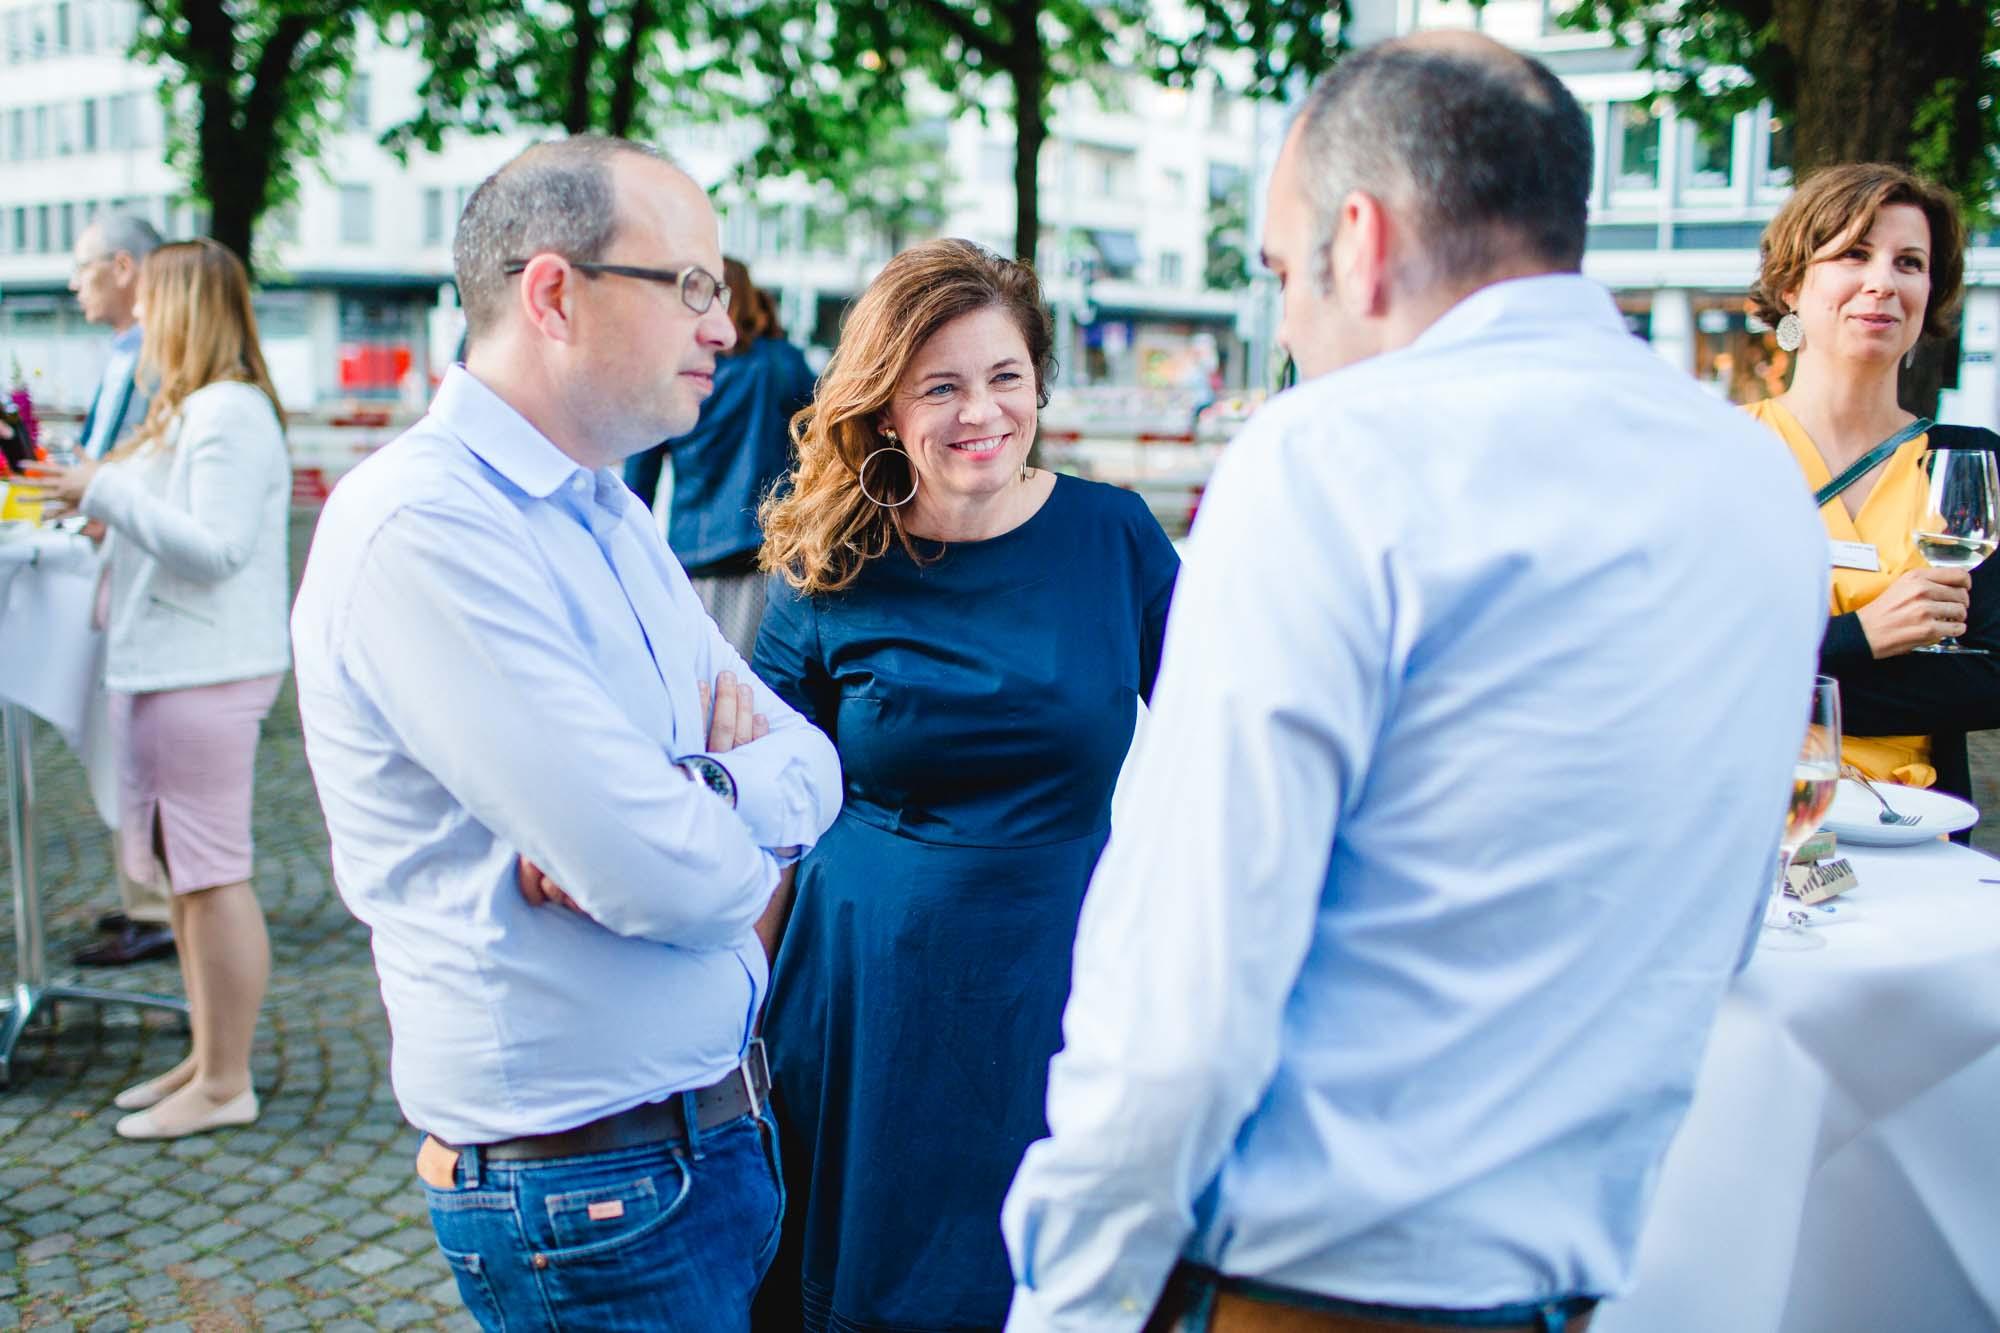 Lorenz Heinzer, Tanja Kocher and Patrick Stoll